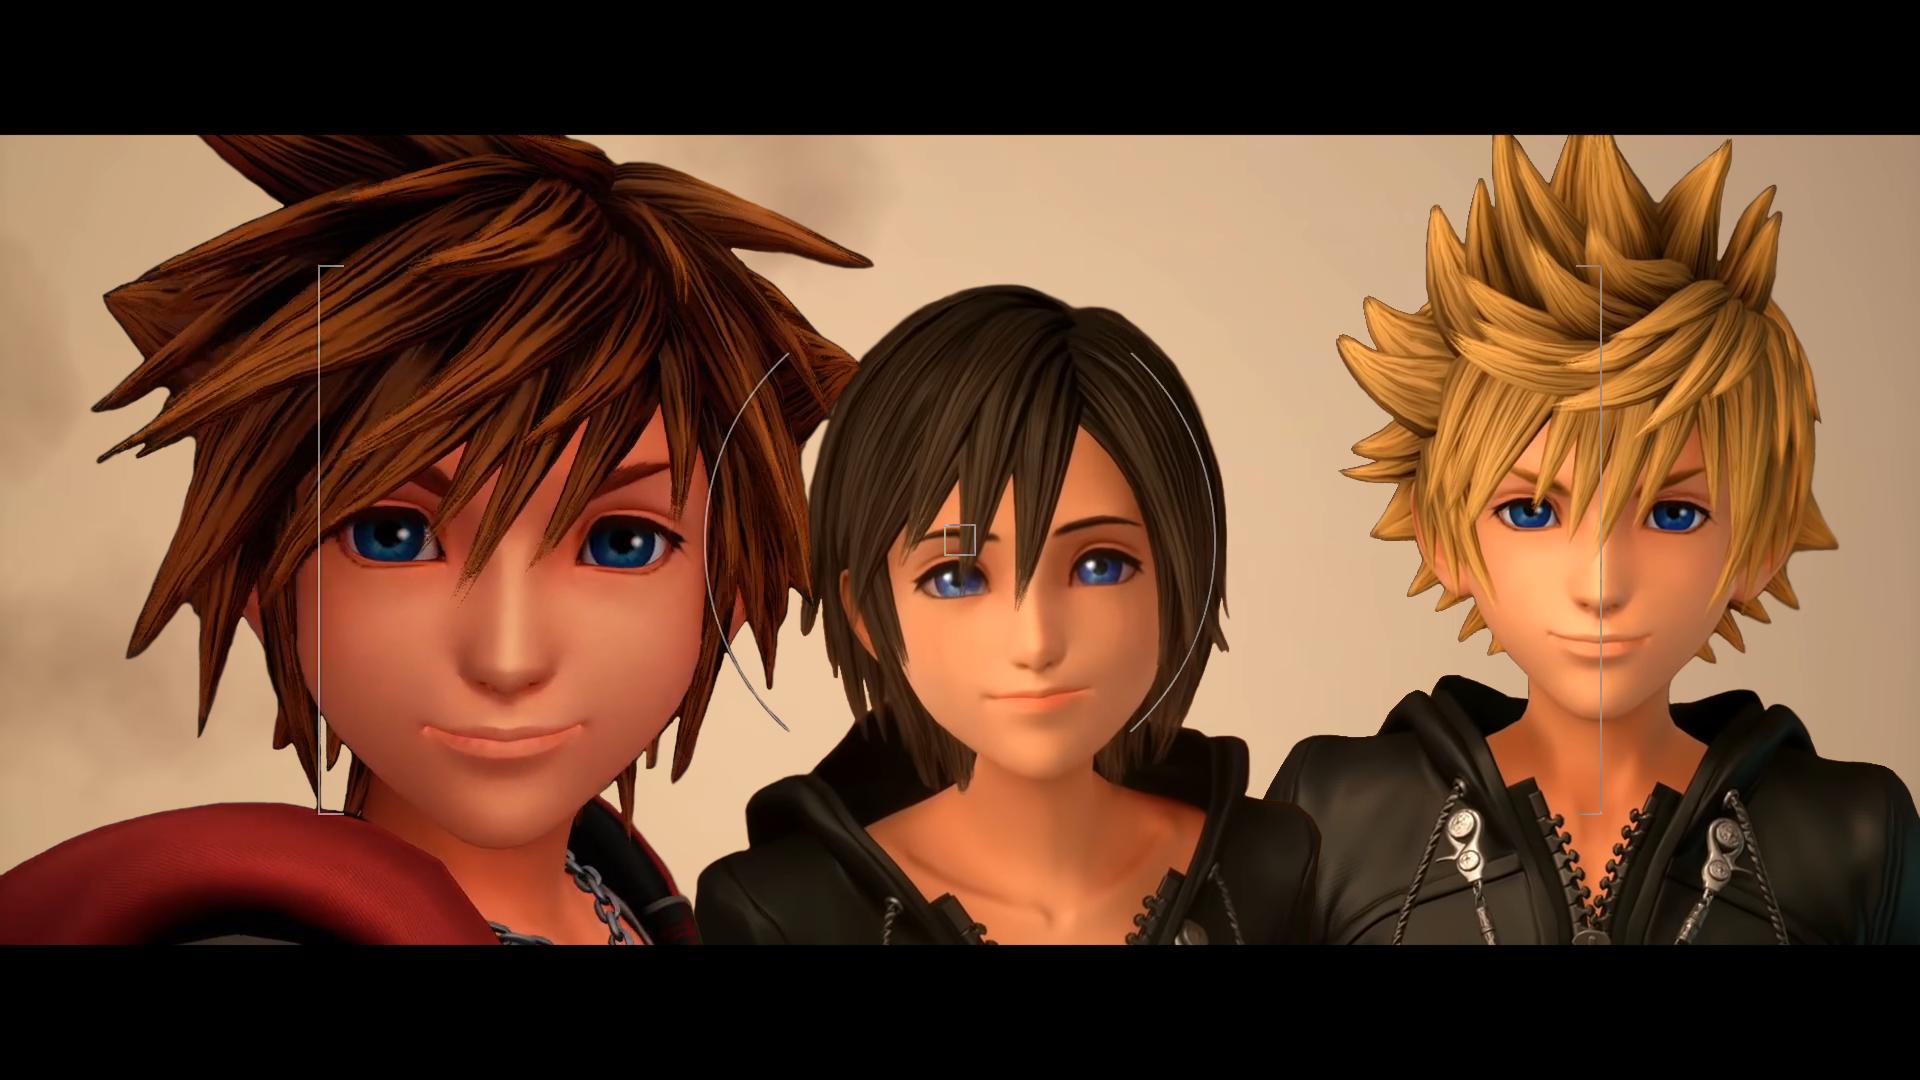 Kingdom Hearts 3 Sora Xion And Roxas Wallpaper By